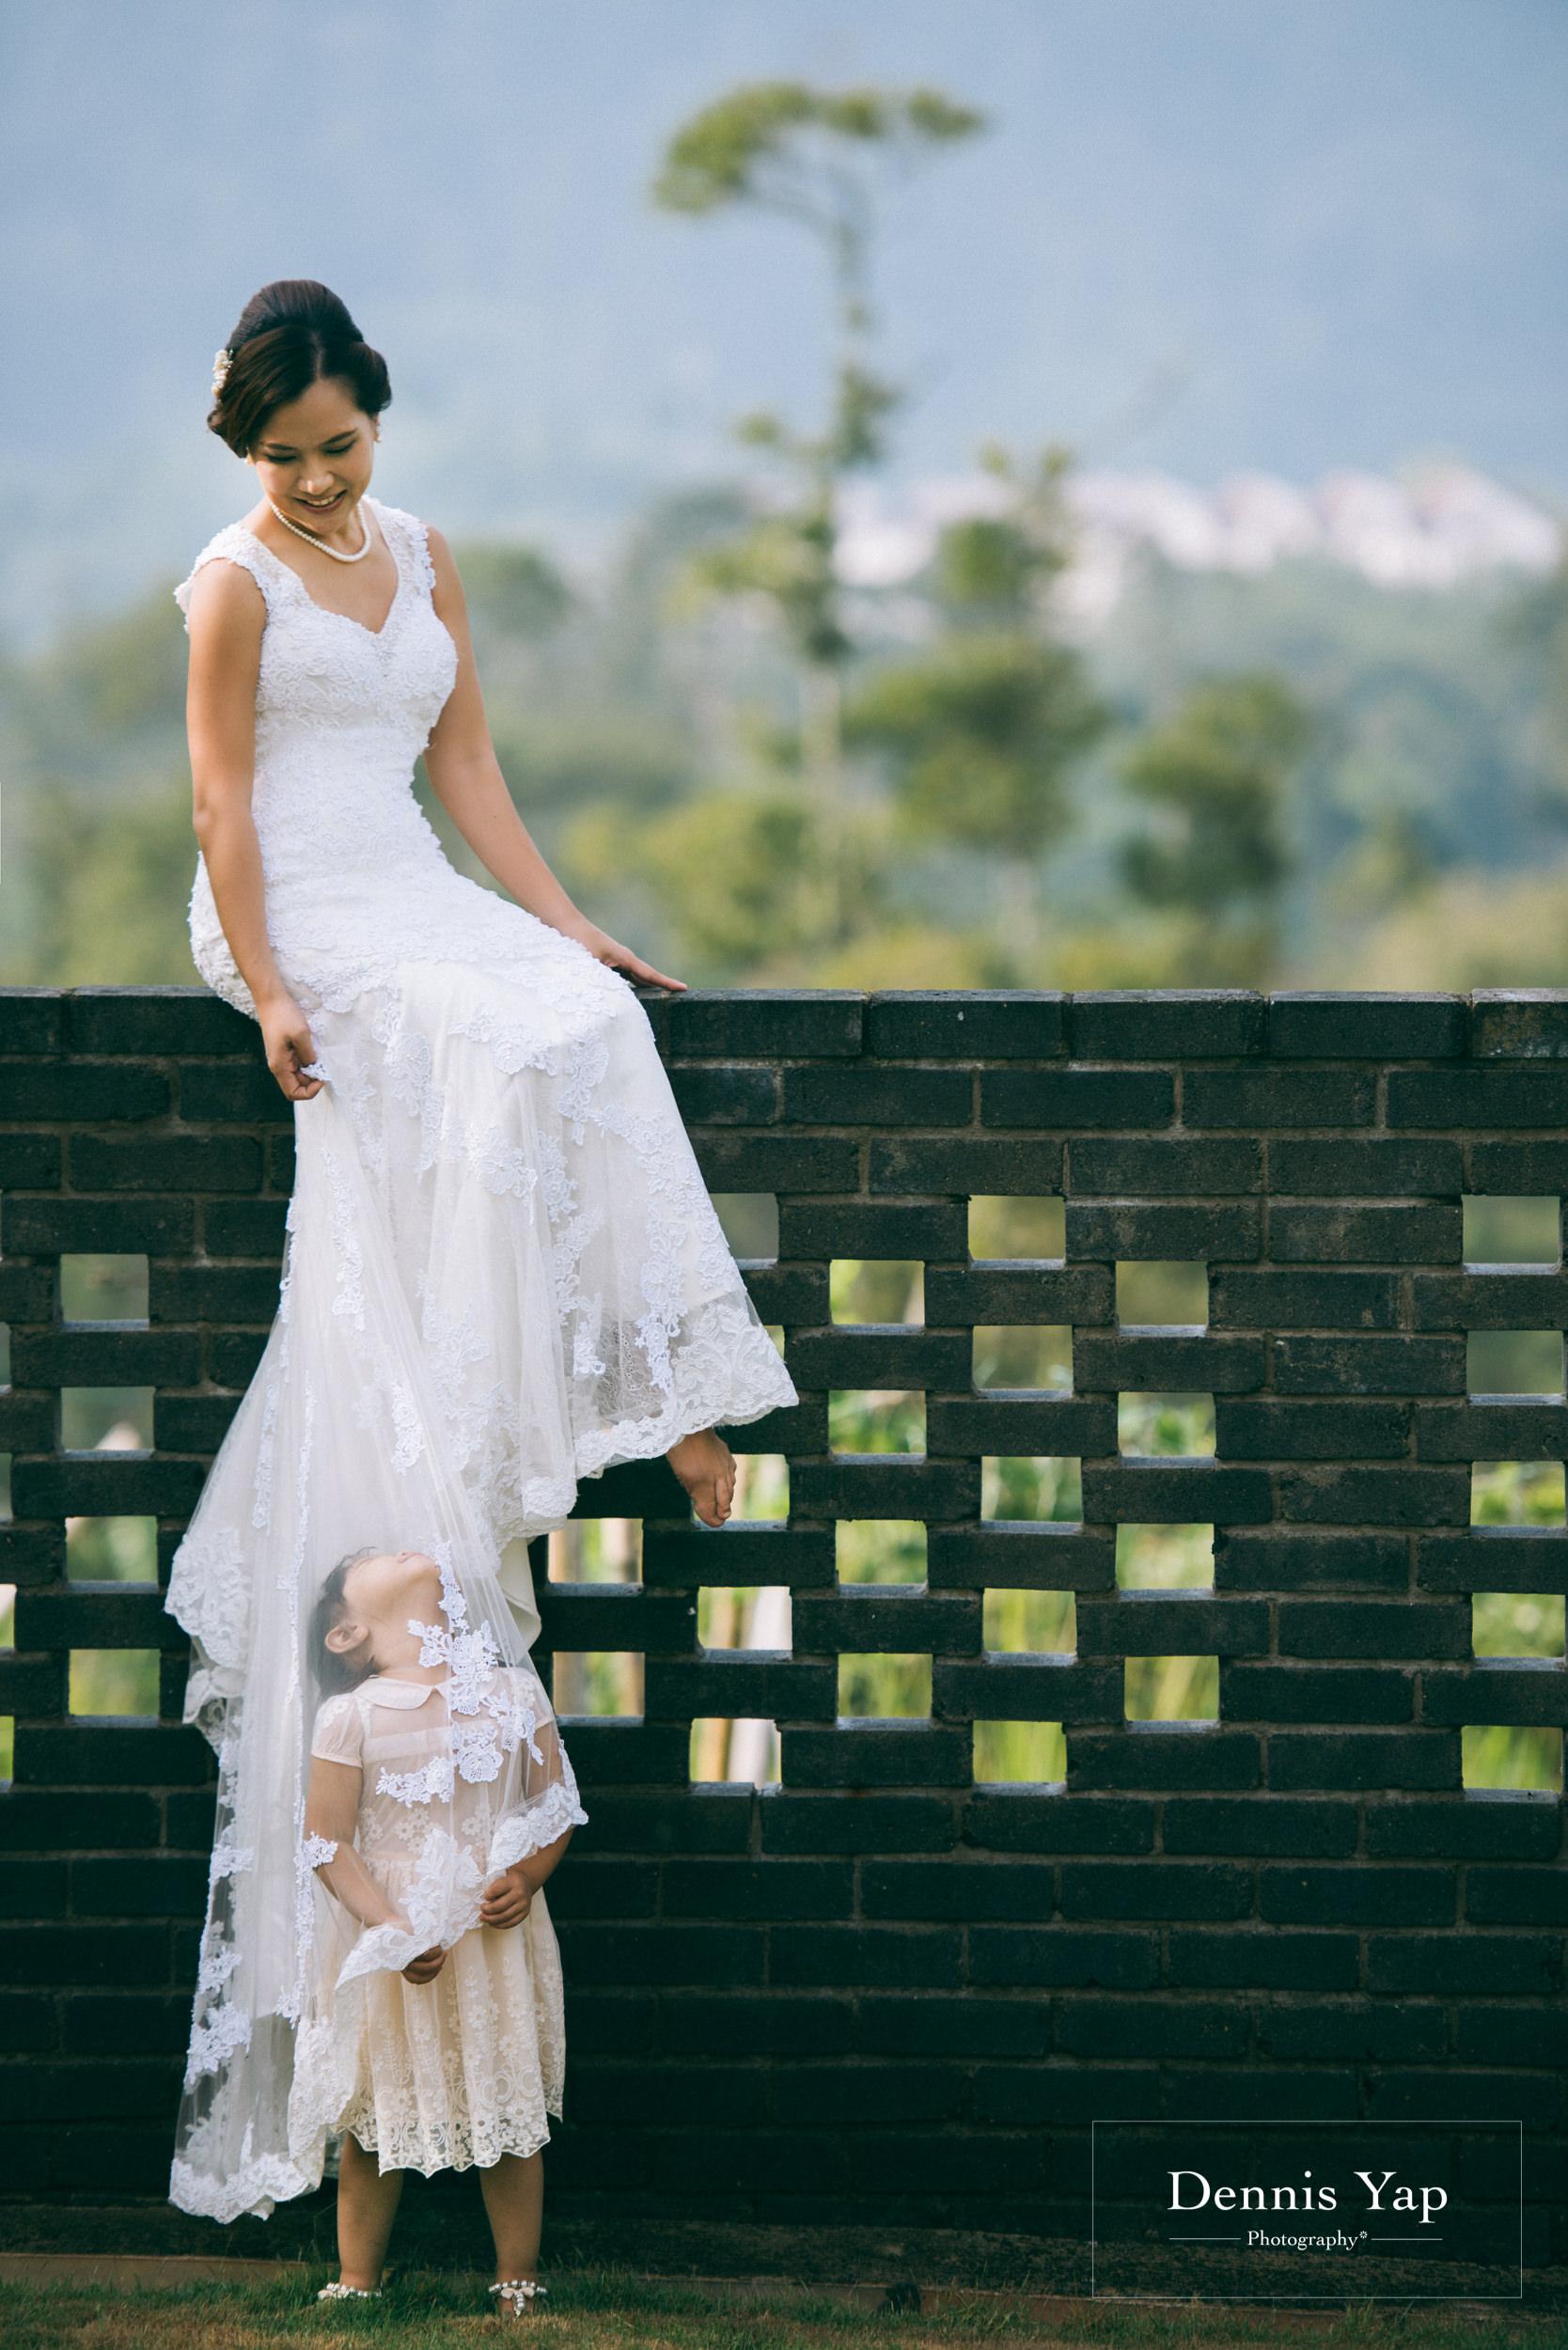 jung munn yein prewedding baby family dennis yap photography janda baik-7.jpg